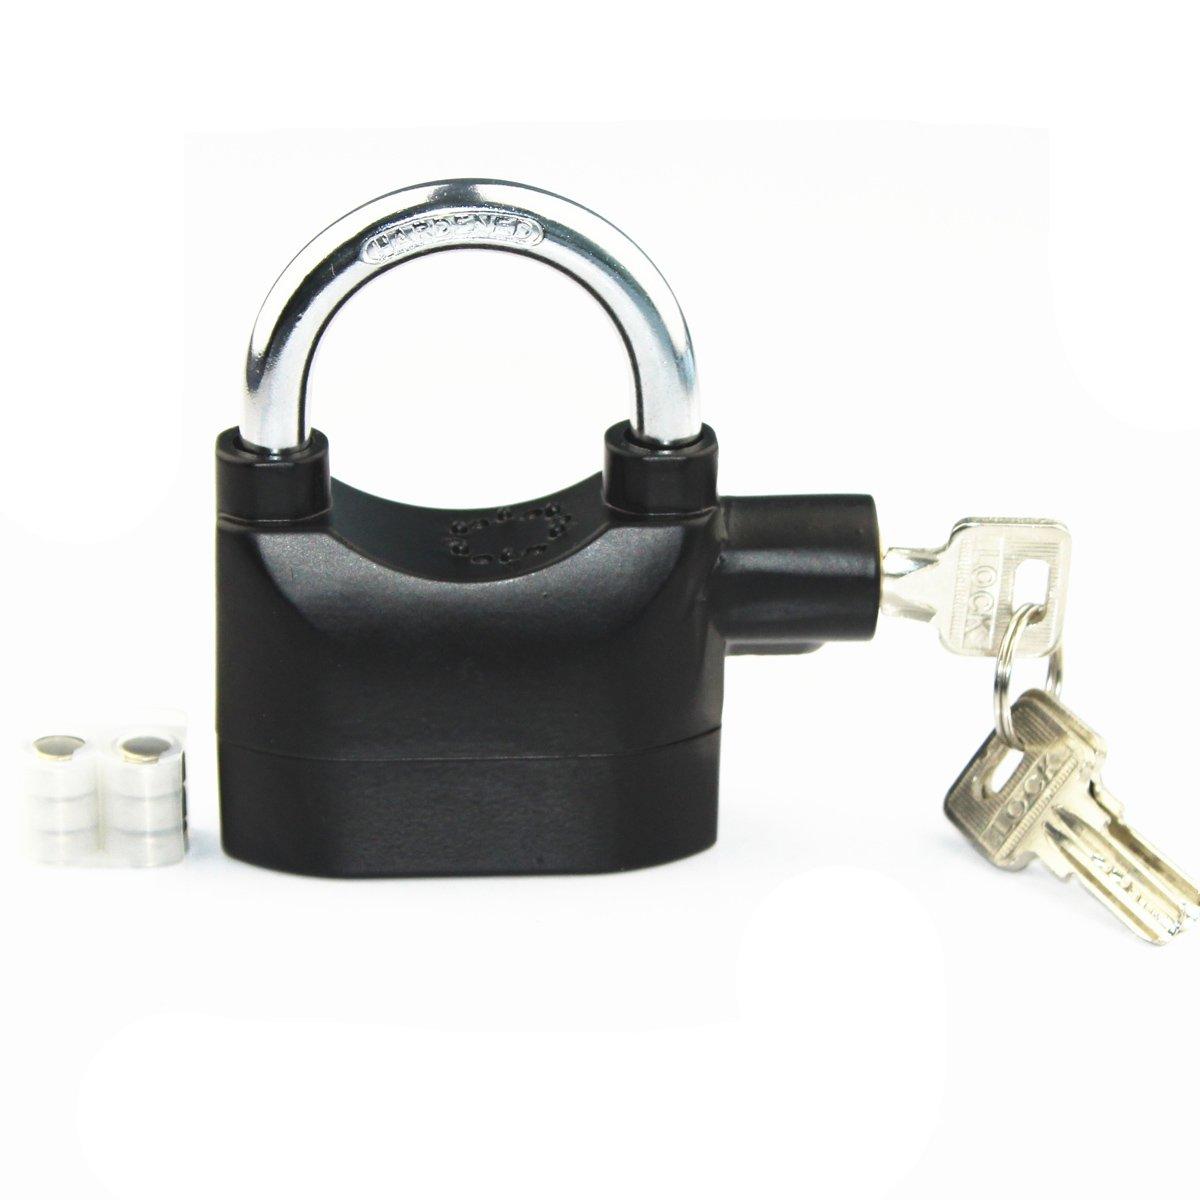 LianShi Universal Security Alarm Lock SystemAnti-Theft for Door Motor Bicycle Padlock 110dB with 3 Keys (Black)